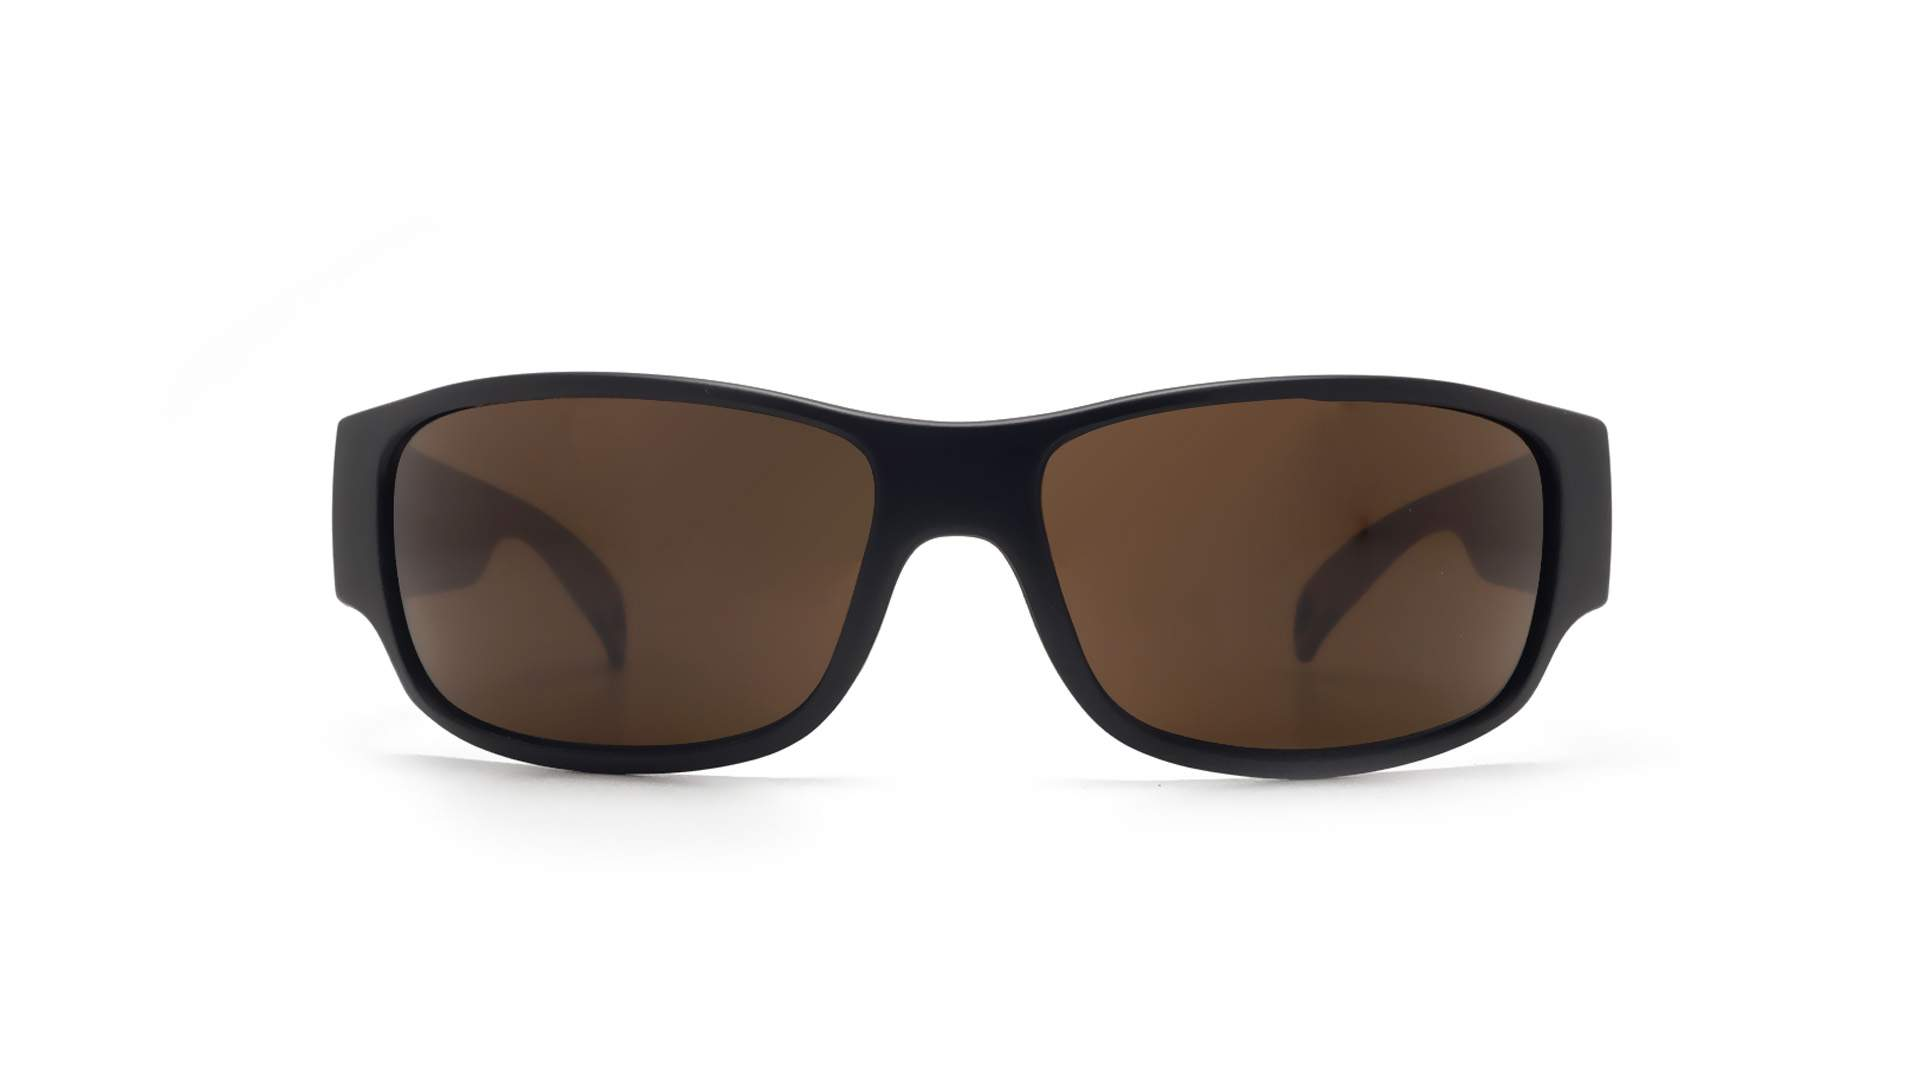 bce5a3dbfe Sunglasses Vuarnet Rider Black Matte VL1621 0001 65-18 Large